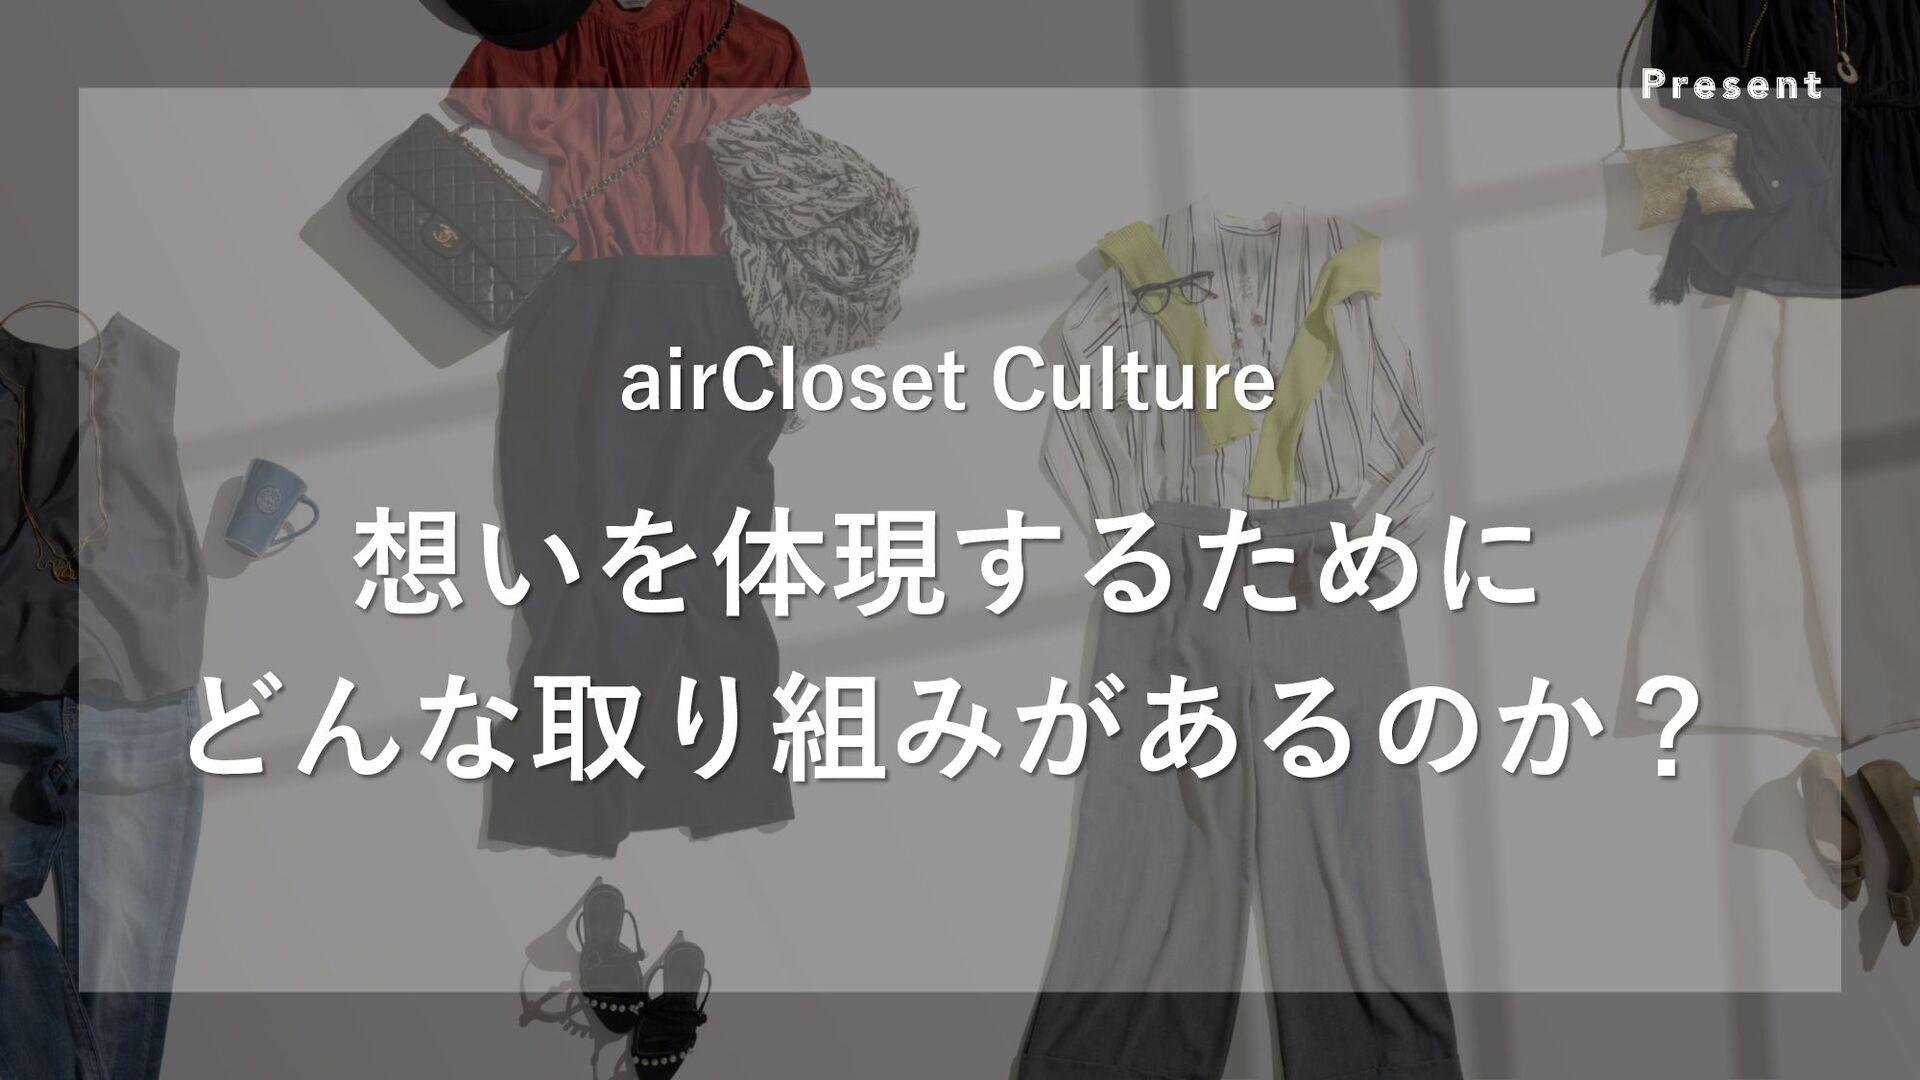 Present airCloset Culture 想いを体現するために どんな取り組みがある...